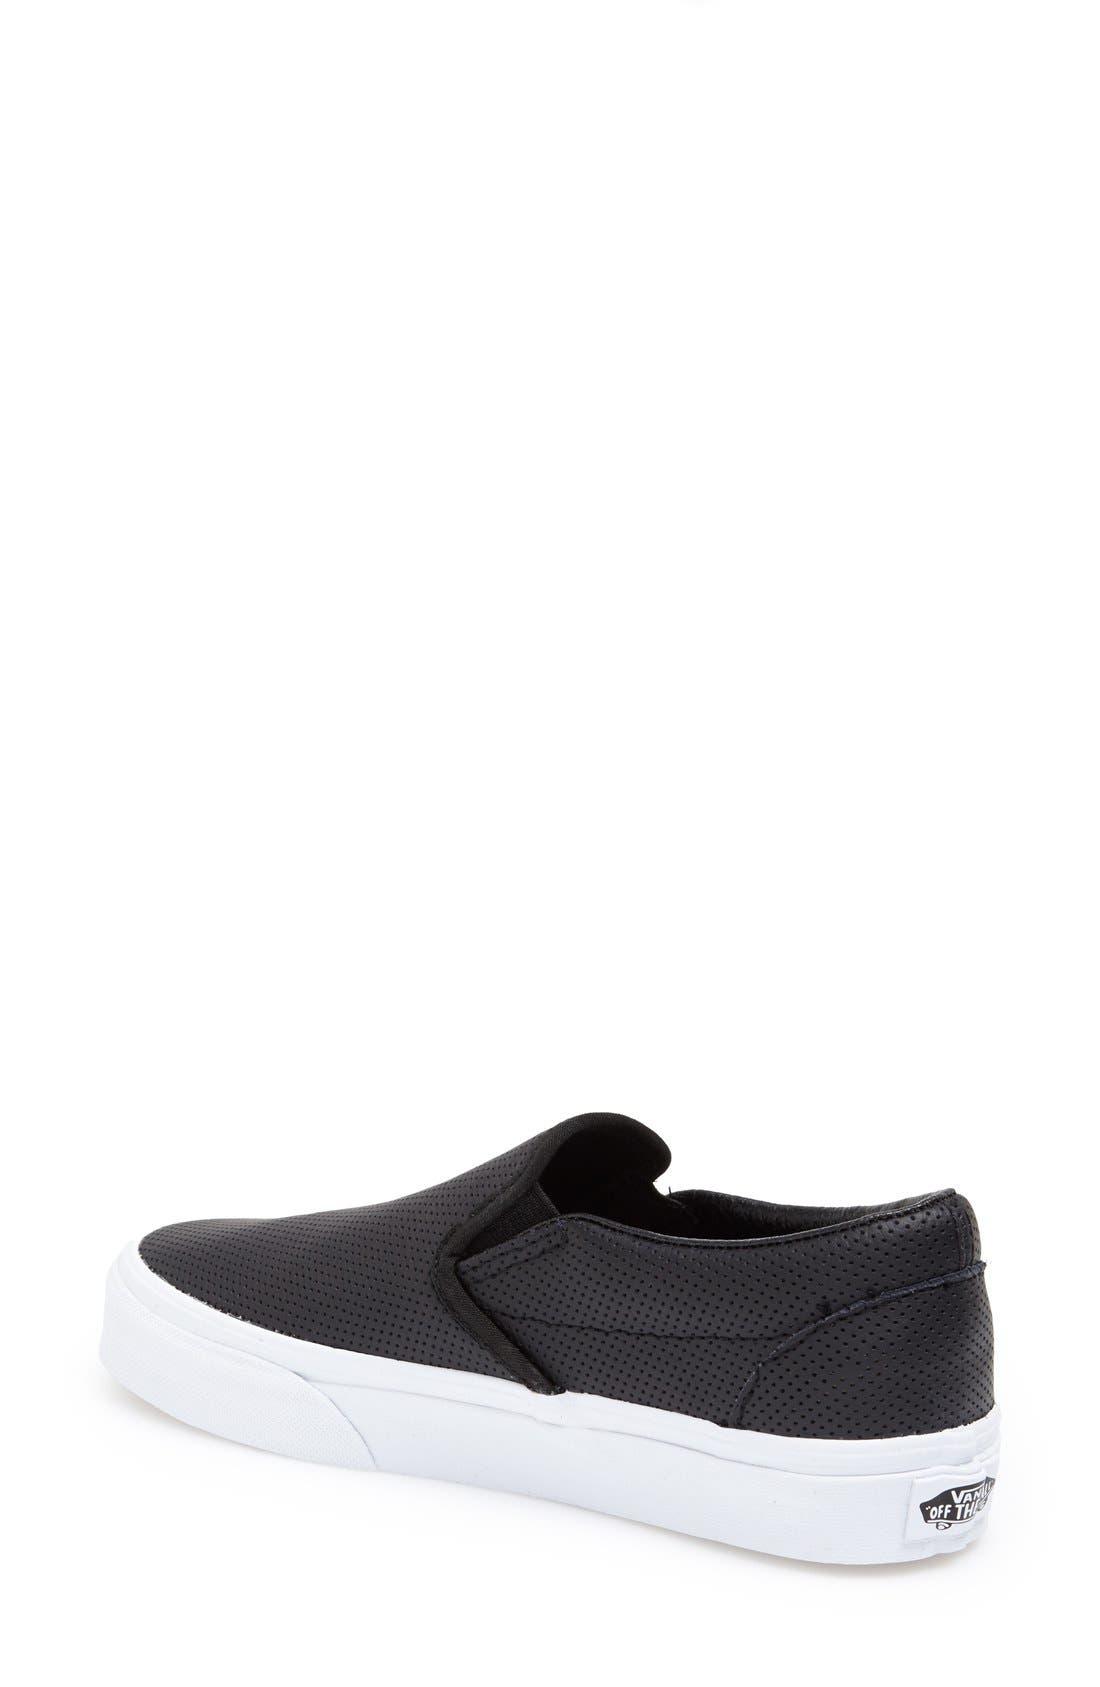 'Classic' Sneaker,                             Alternate thumbnail 3, color,                             LEATHER BLACK